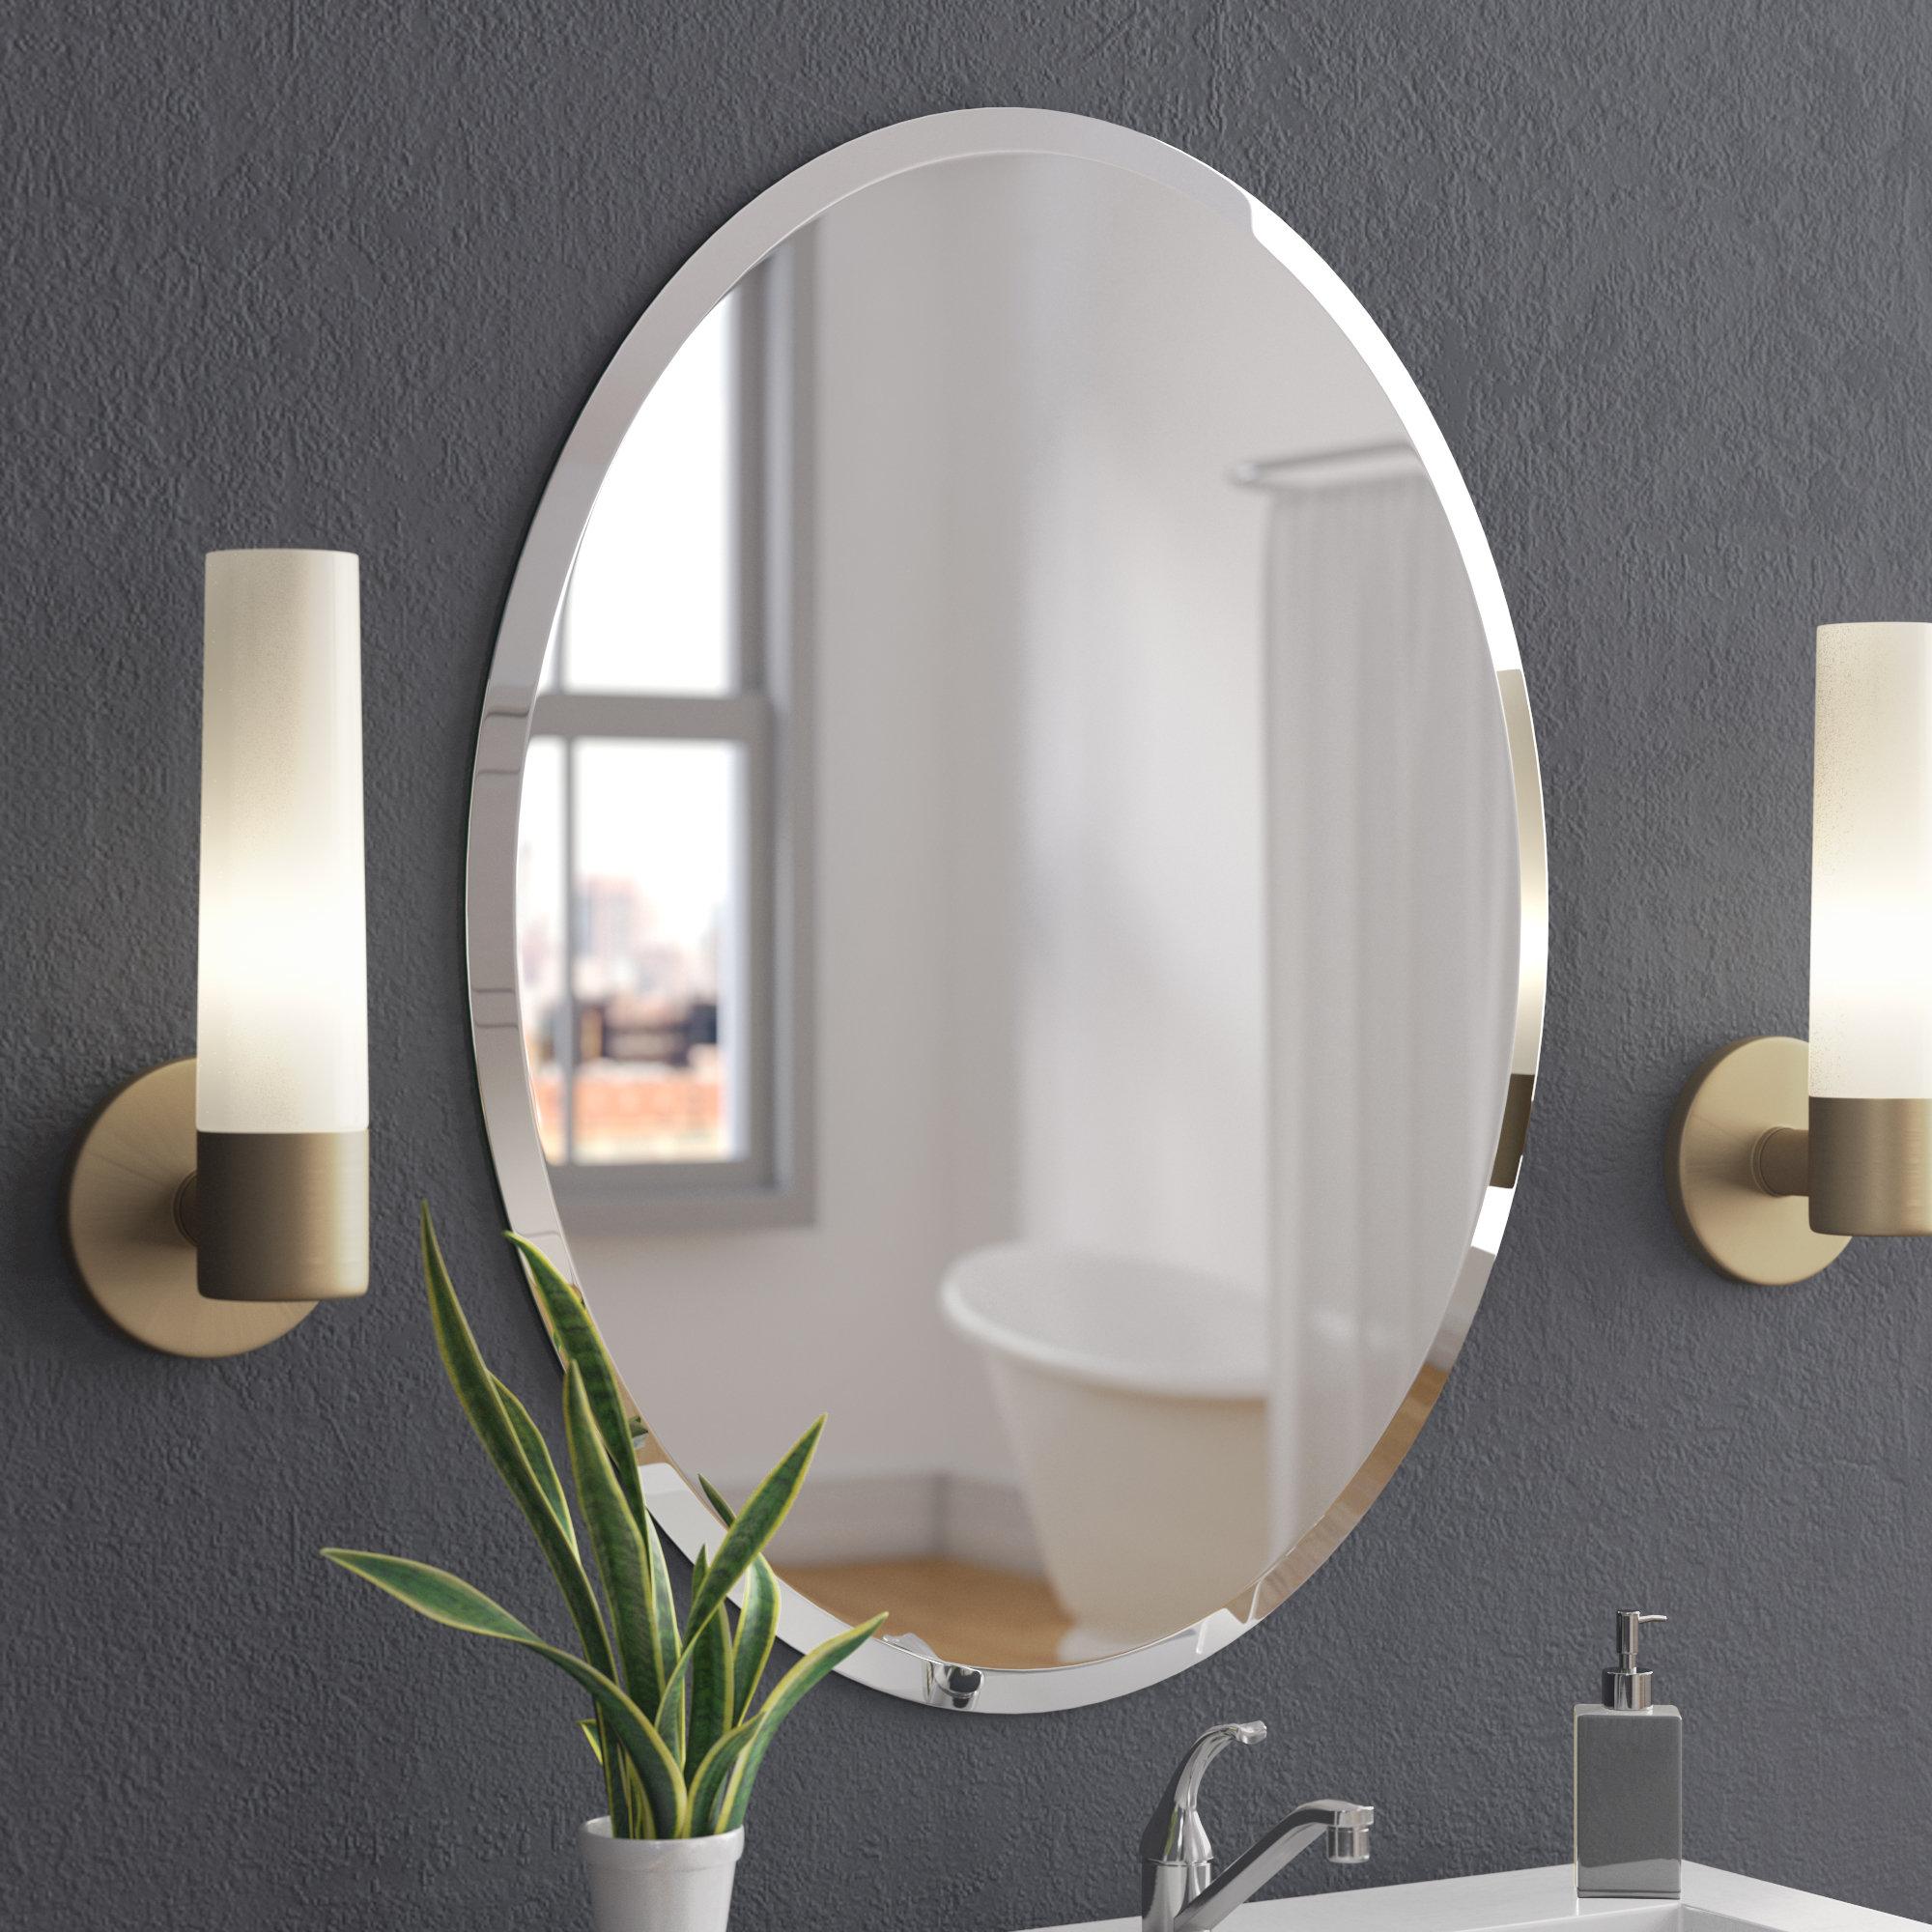 Callison Oval Bevel Frameless Wall Mirror inside sizing 2000 X 2000